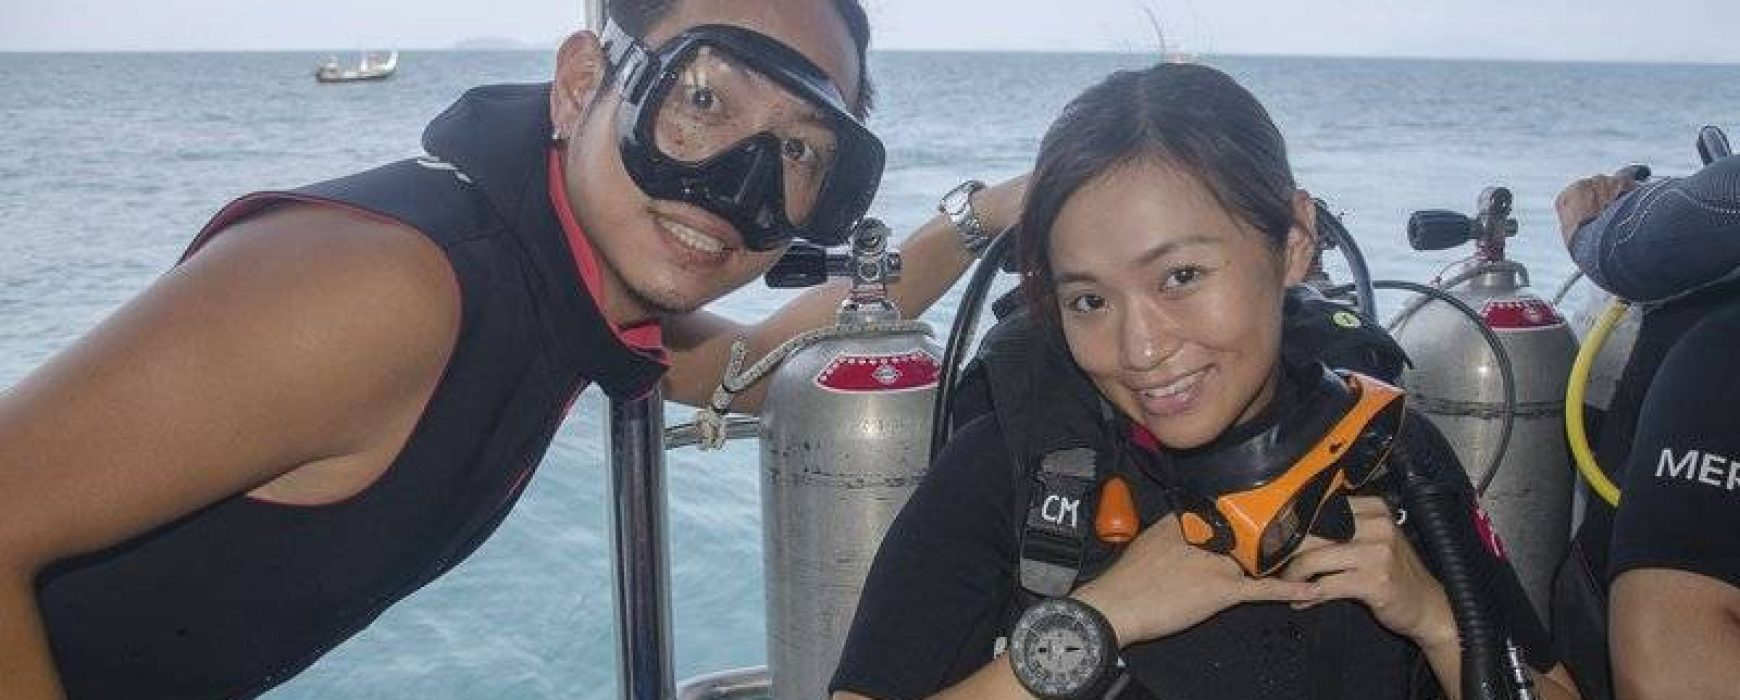 A magical day in Phuket for Ms. Yuka Bando